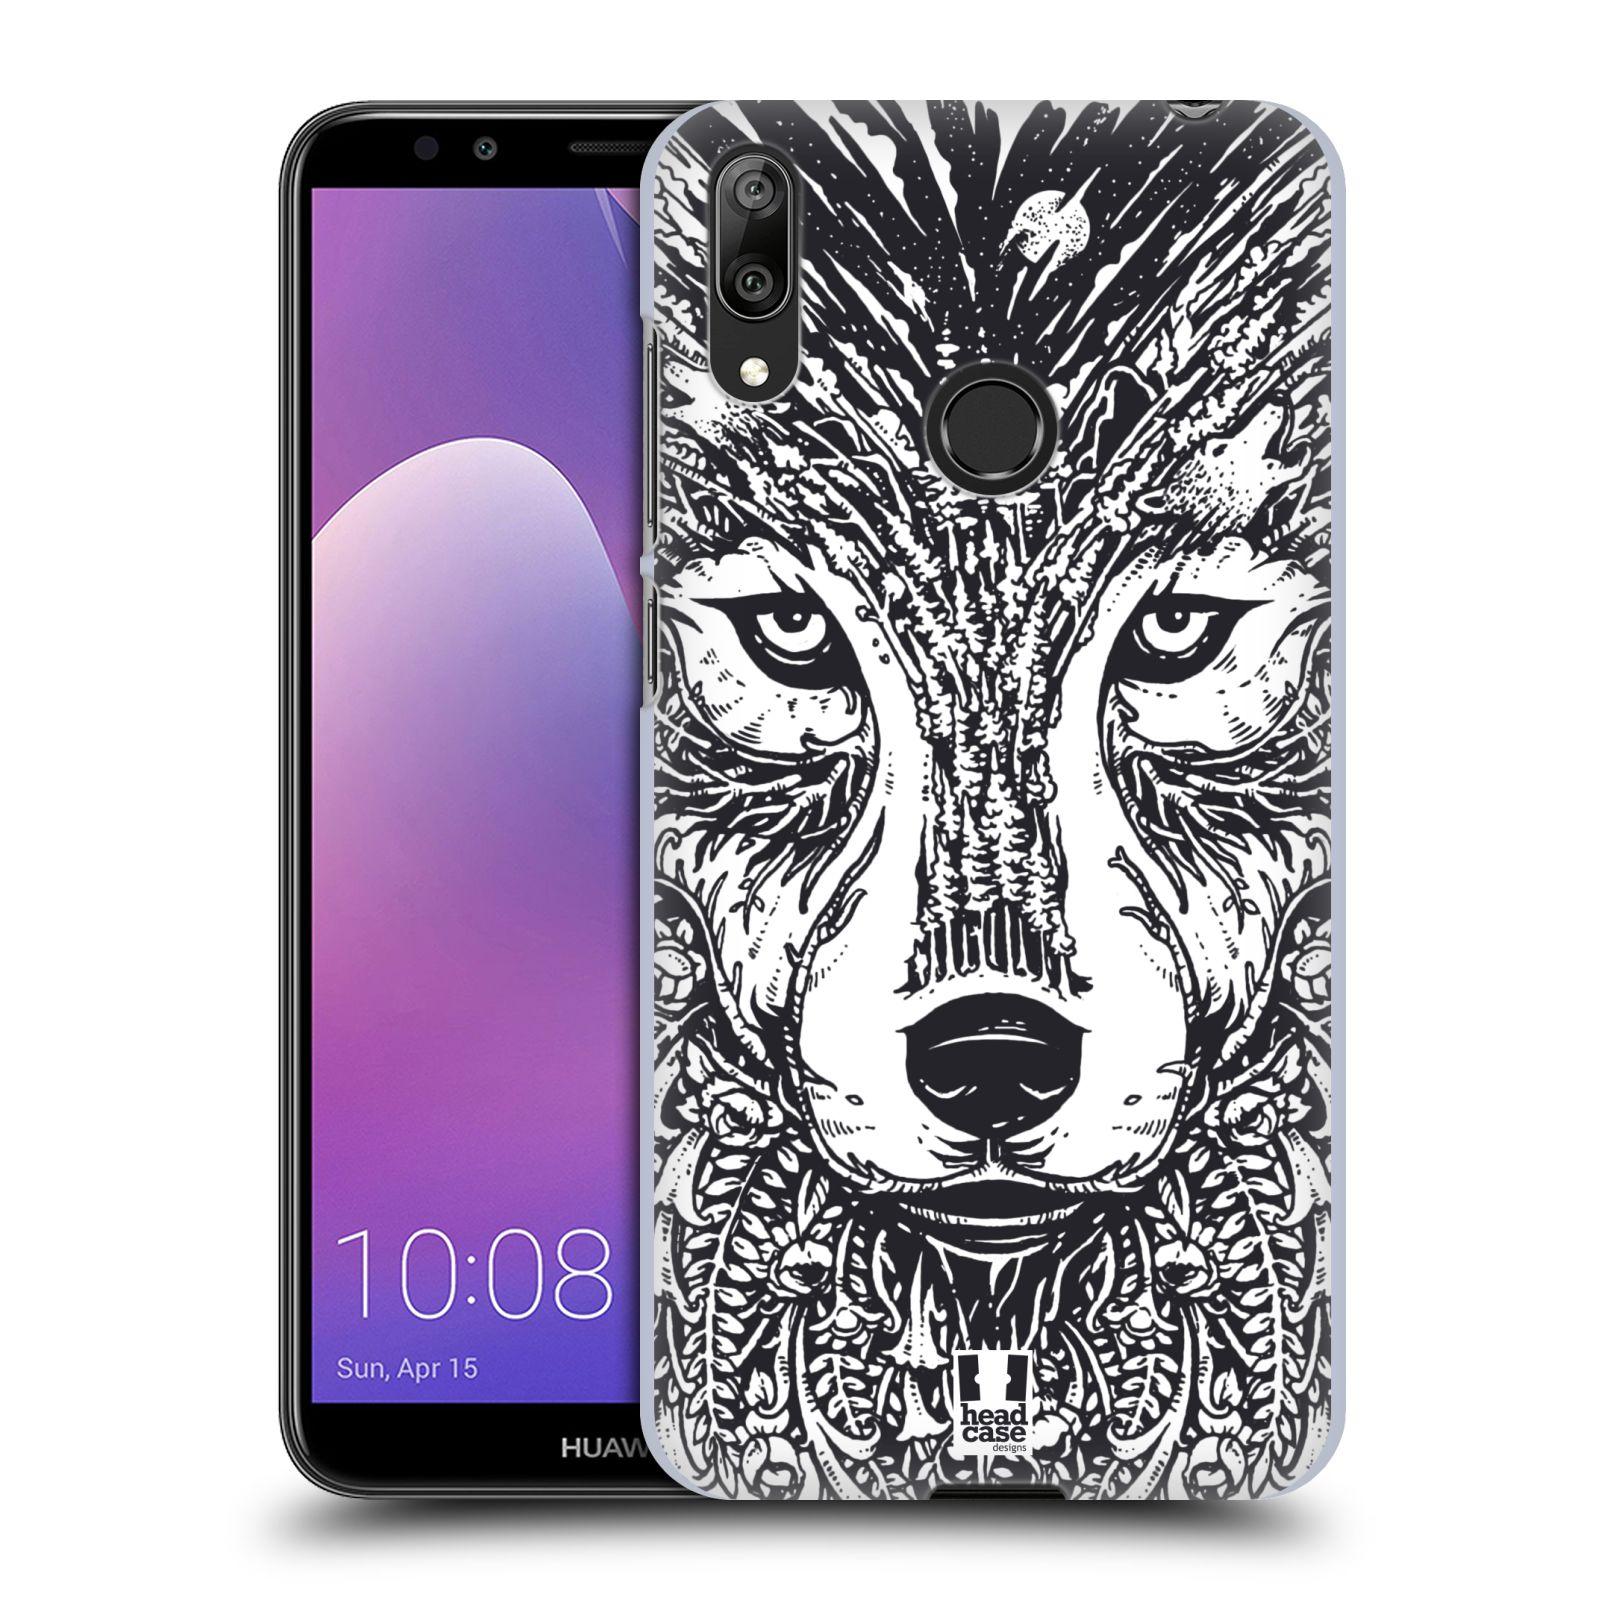 Plastové pouzdro na mobil Huawei Y7 (2019) - Head Case - DOODLE TVÁŘ VLK